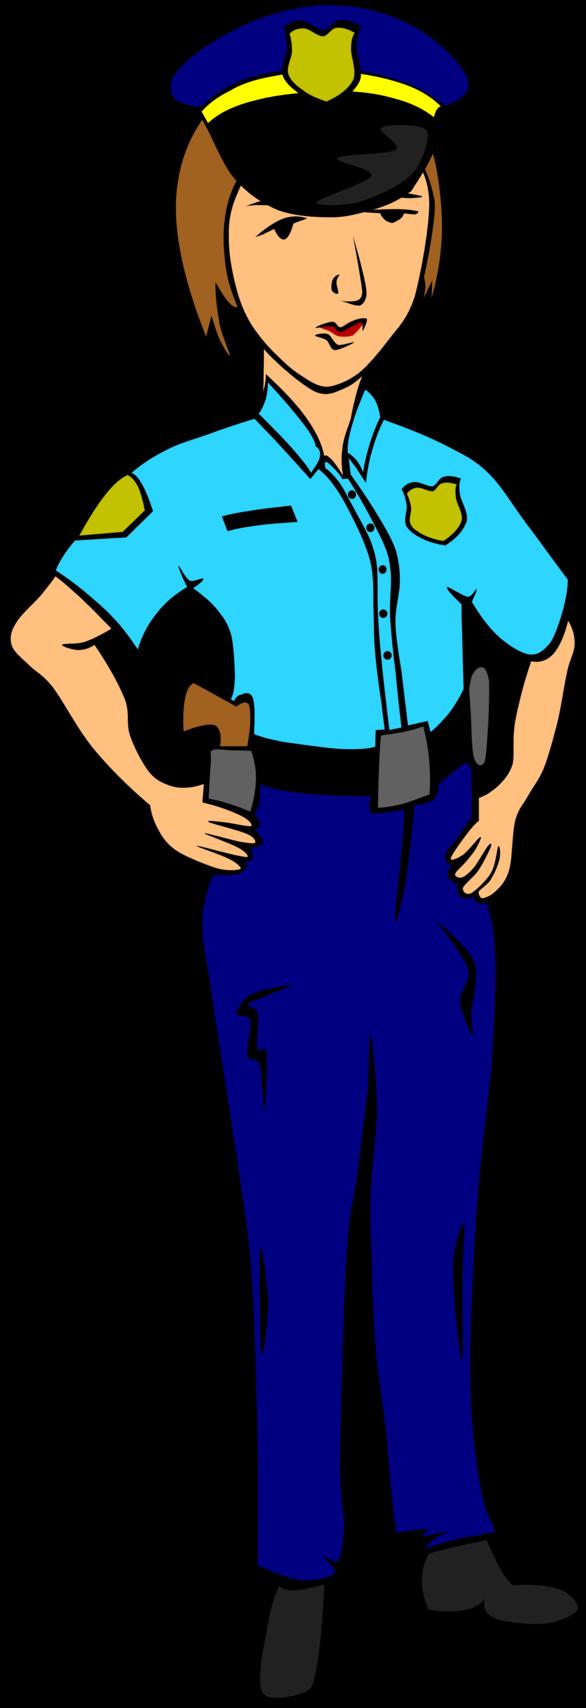 586x1708 Policeman Clipart